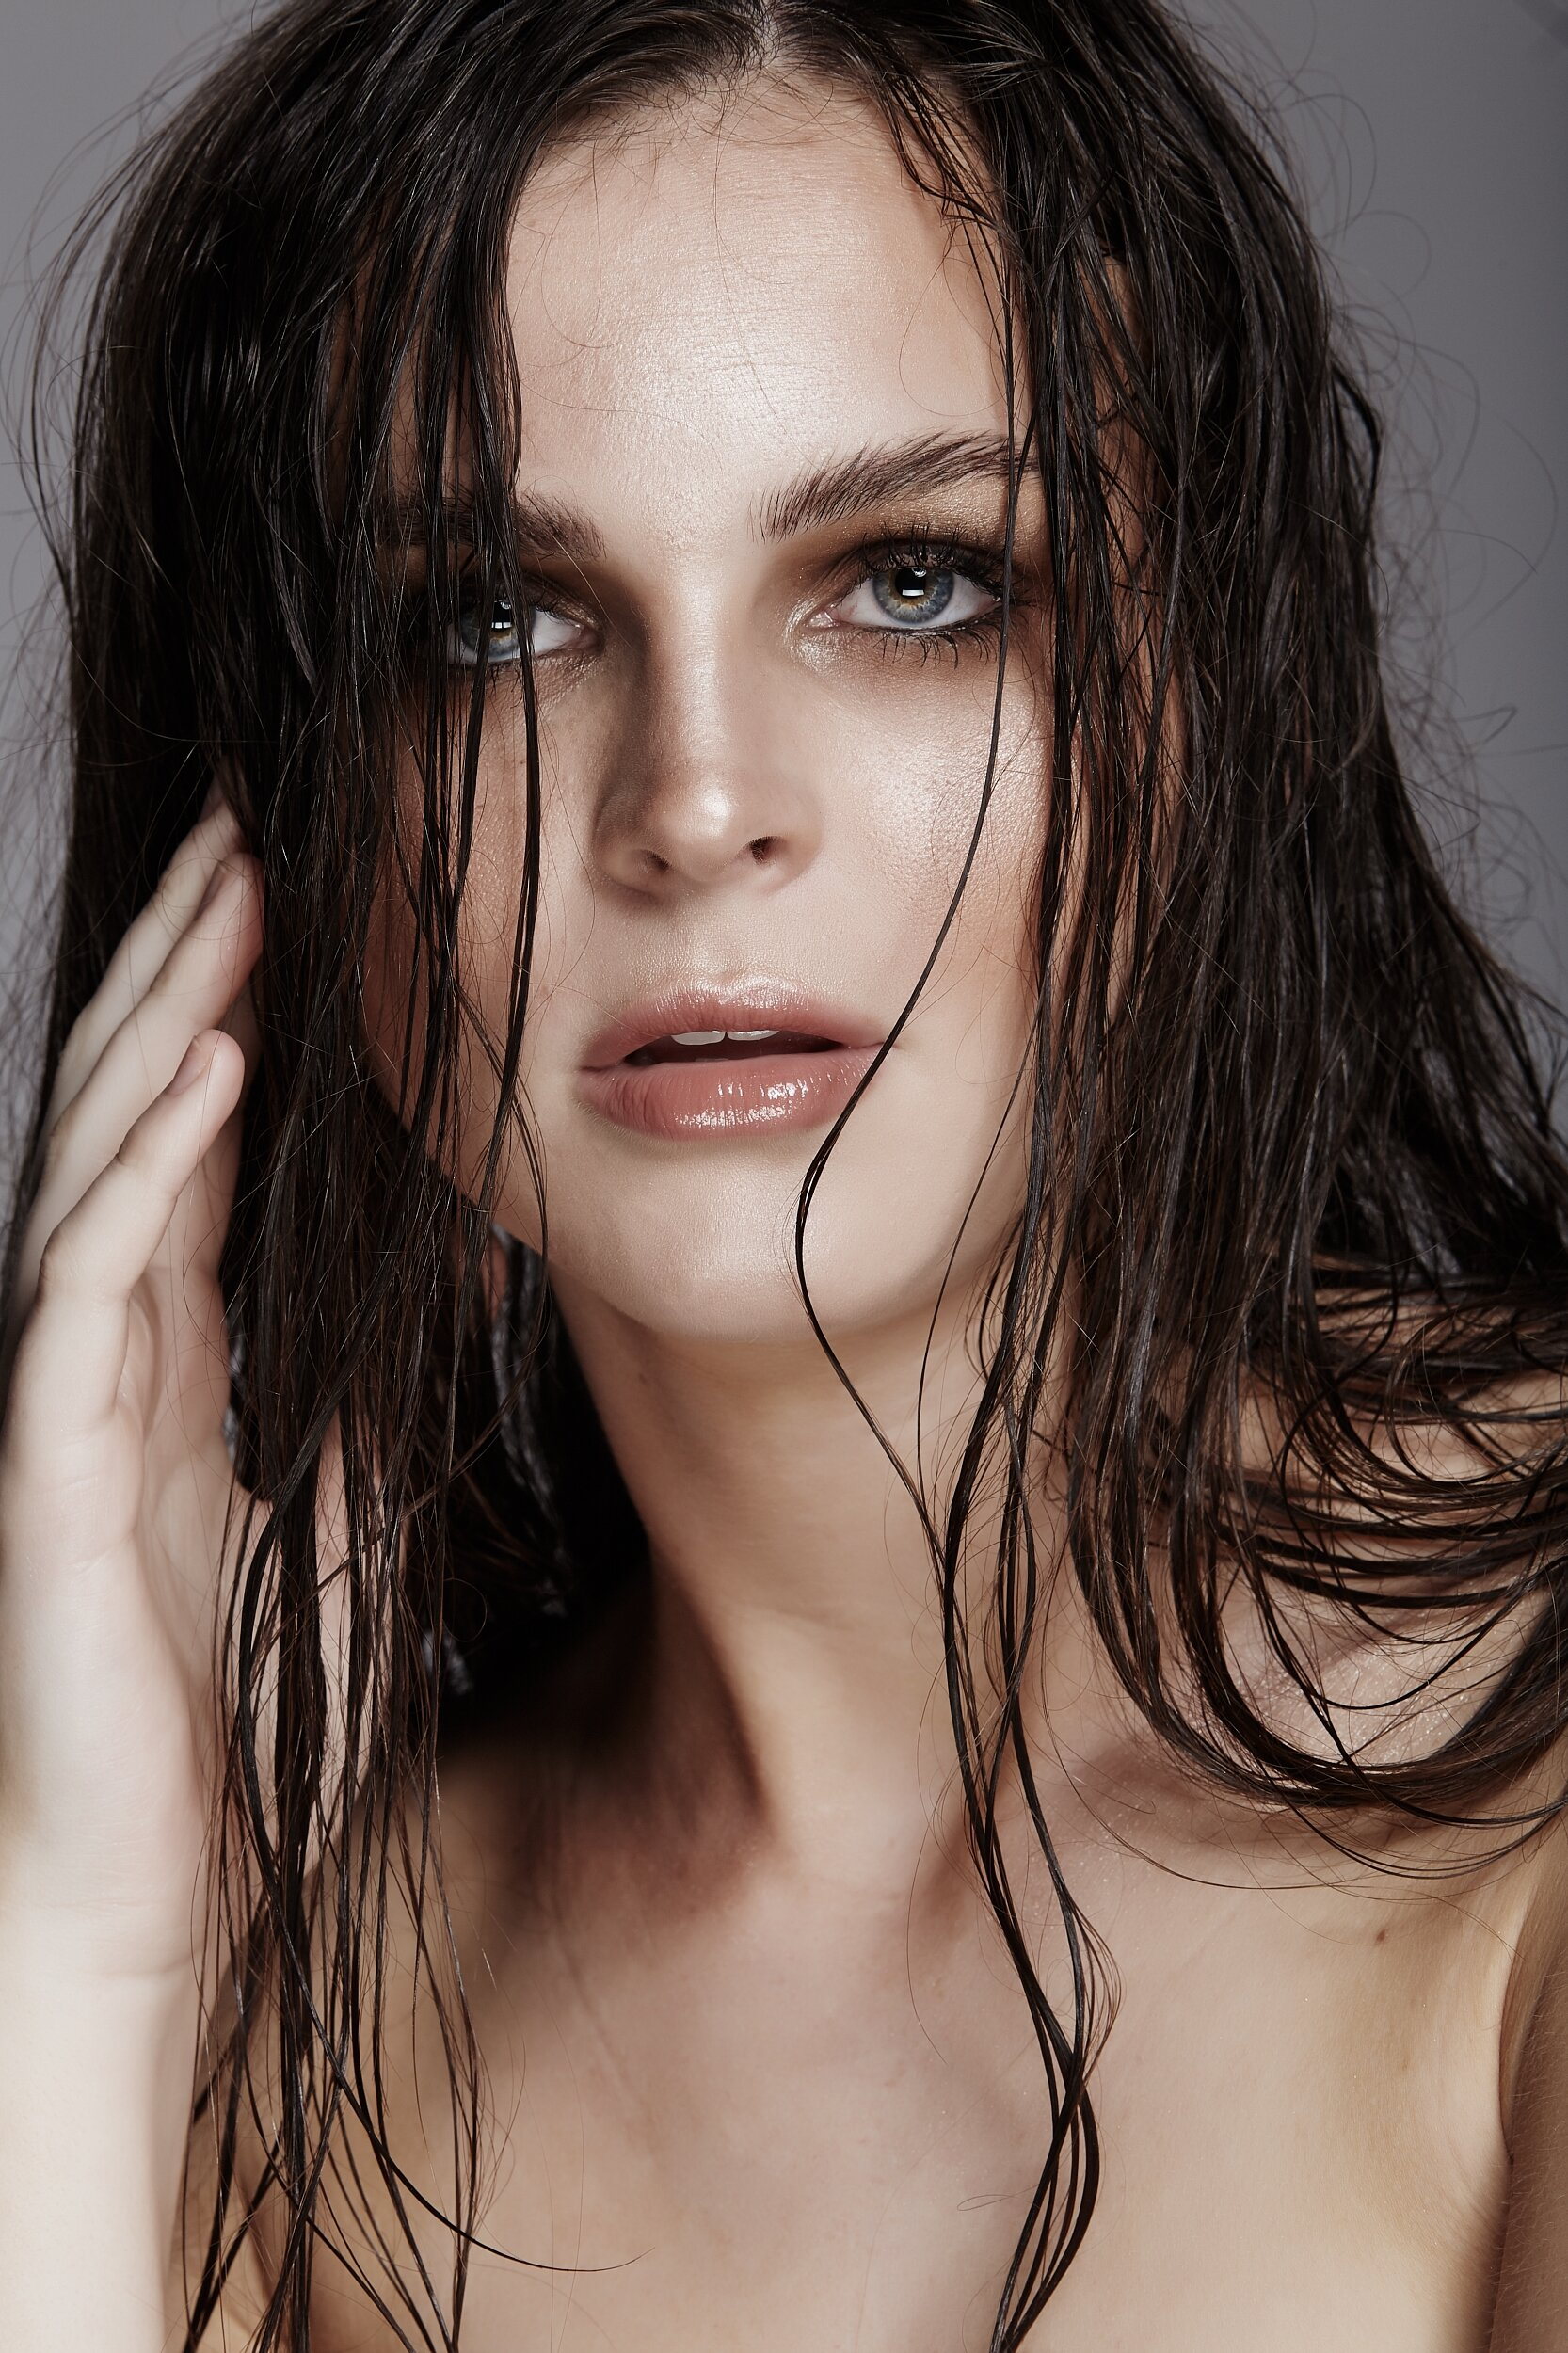 Photographer: Tate Chmielewski Model: Kaityln Lloyd